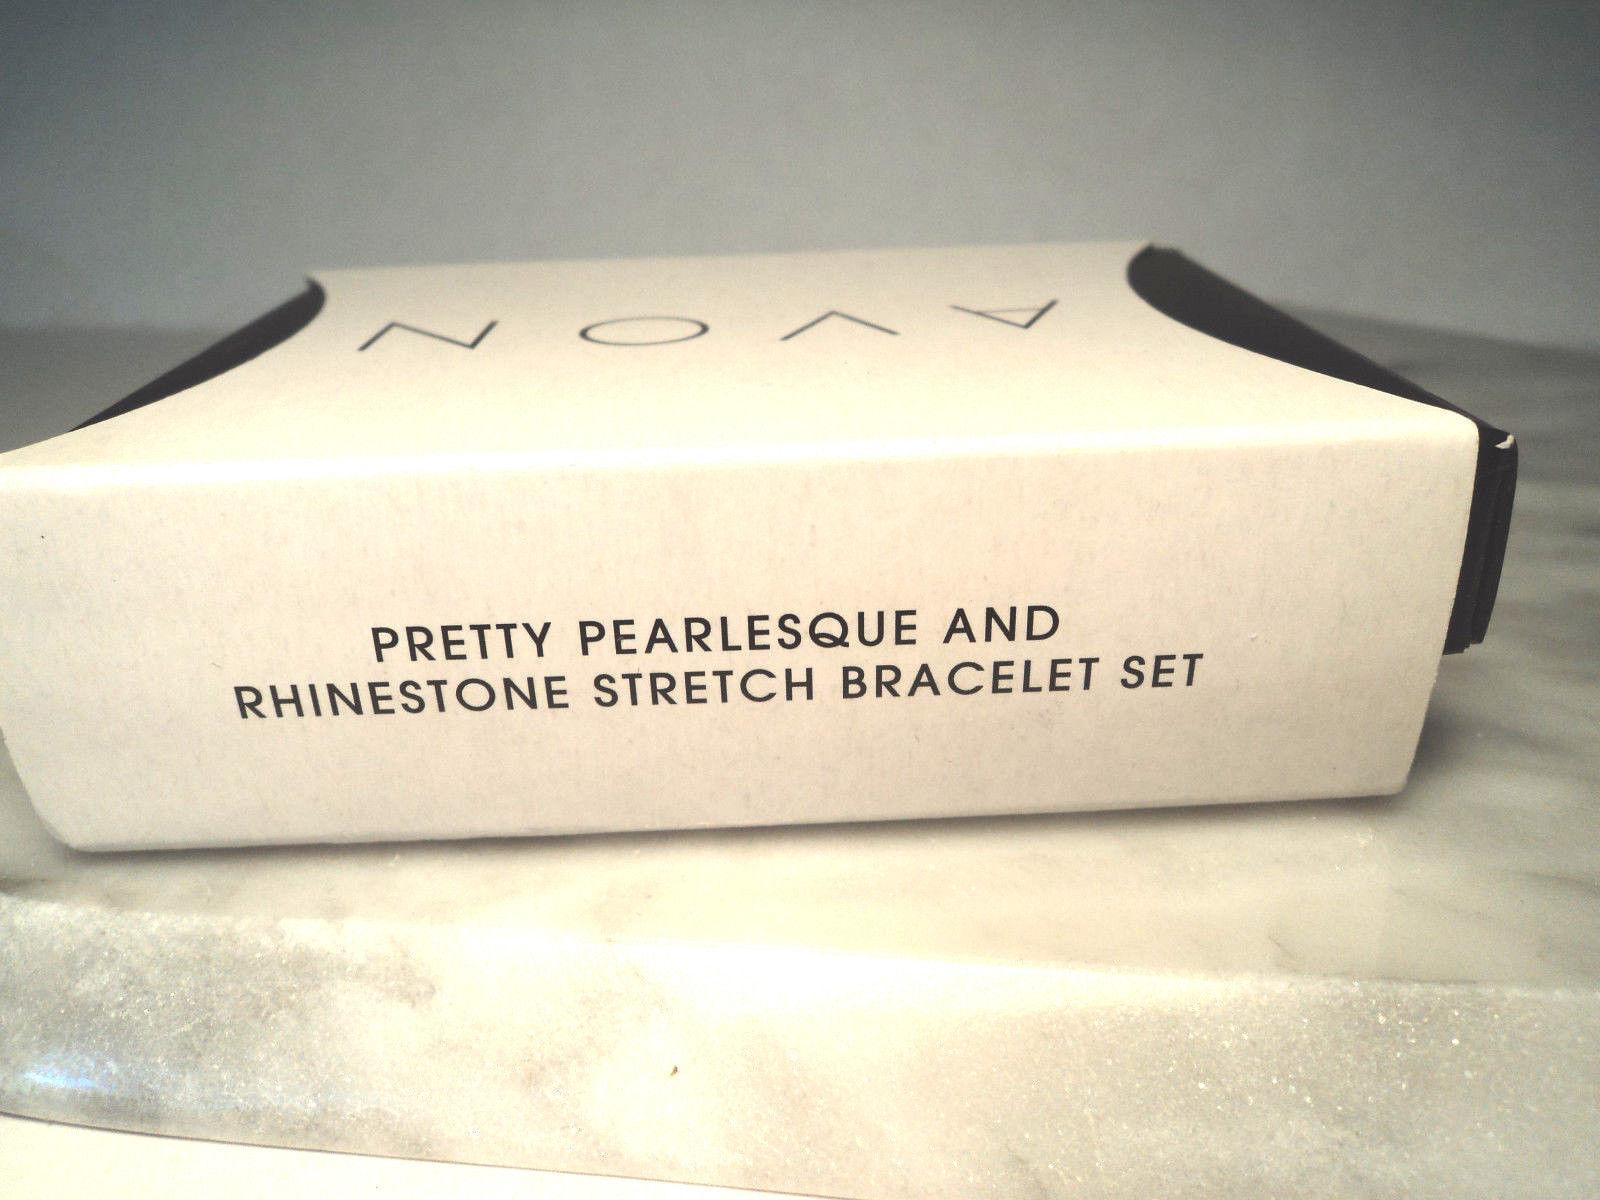 Avon Pretty Pearlesque and Rhinestone Stretch Bracelet Set New 2011 image 6